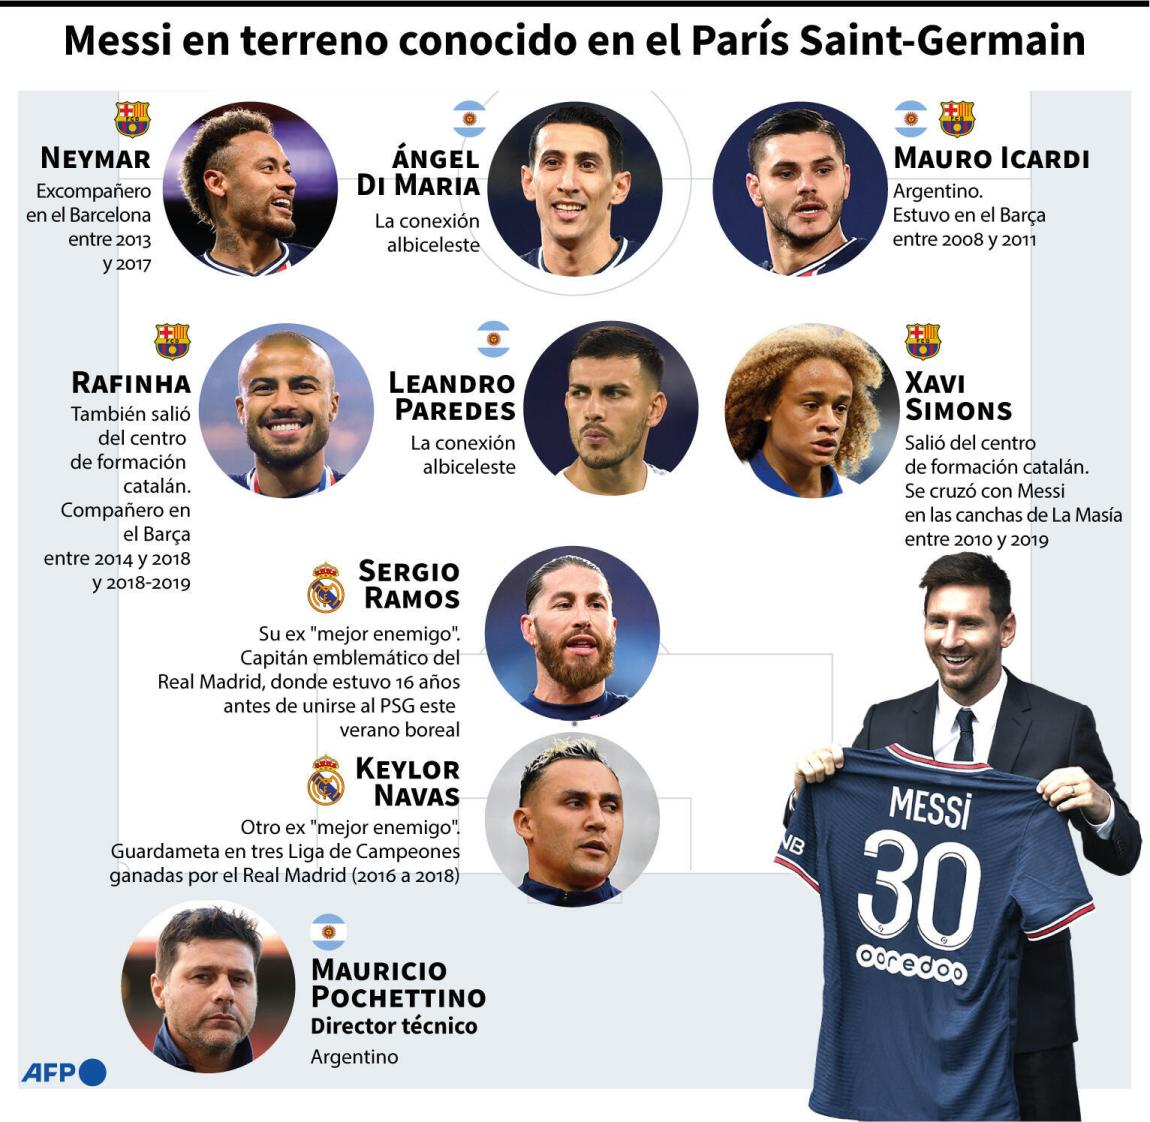 Messi on familiar ground at Paris Saint-Germain.